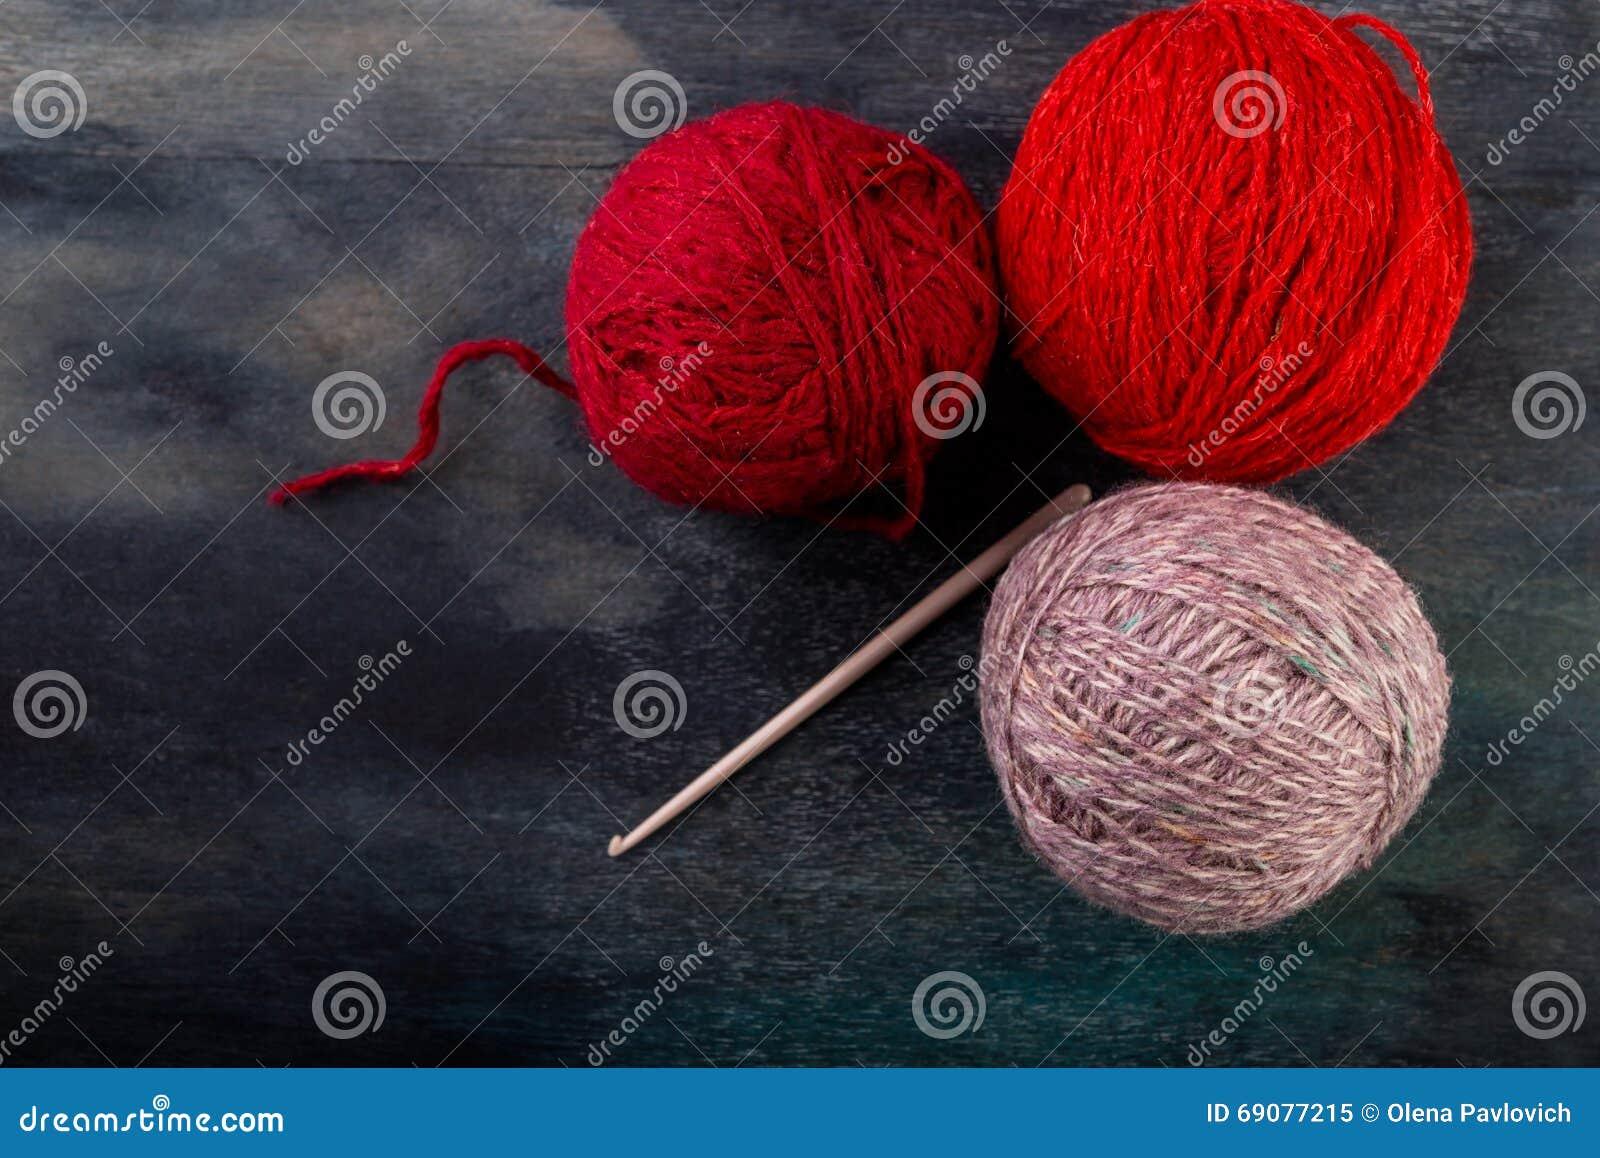 ball of yarn crochet - photo #43